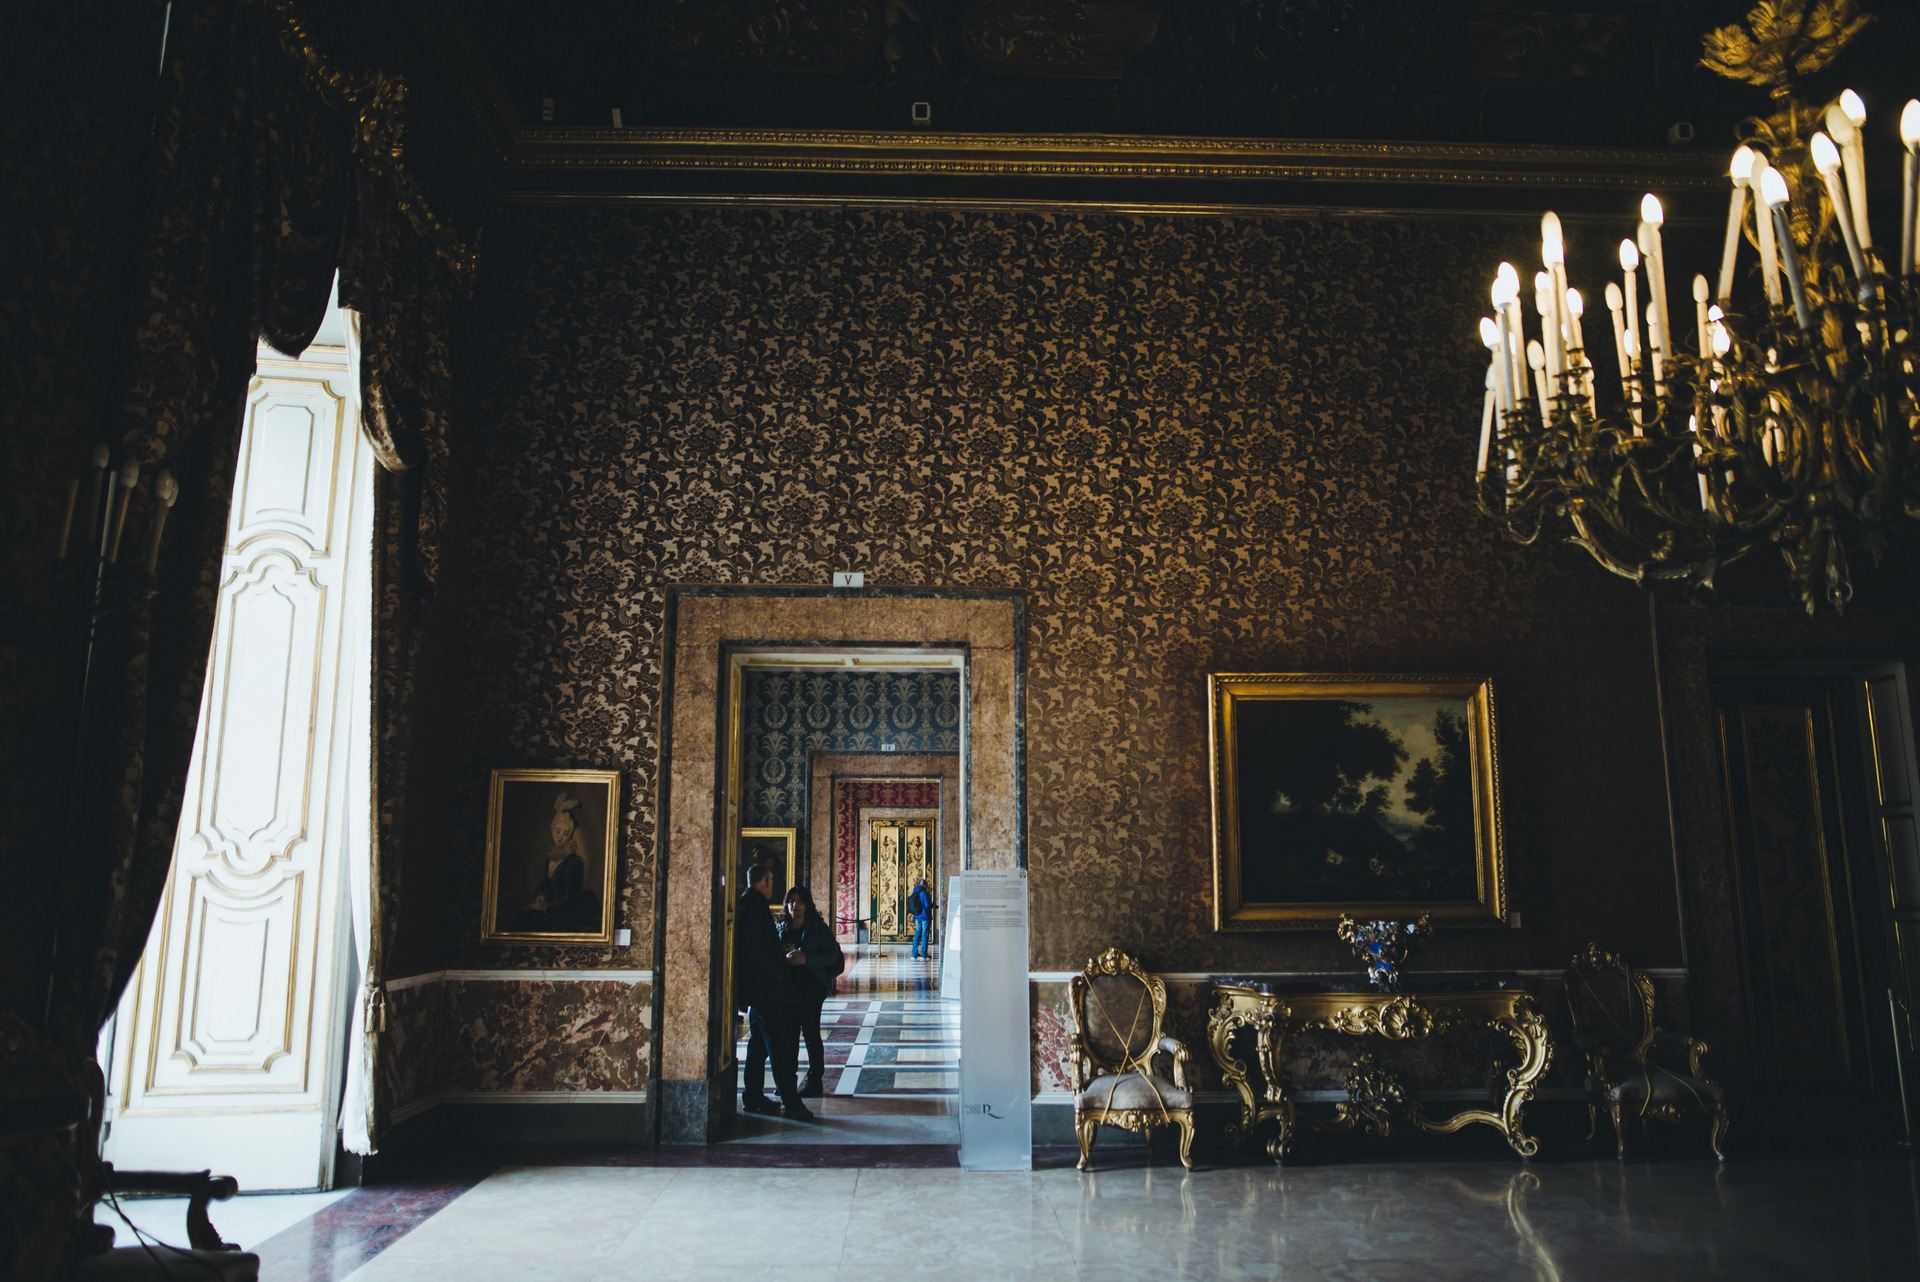 palazzo reale neapol